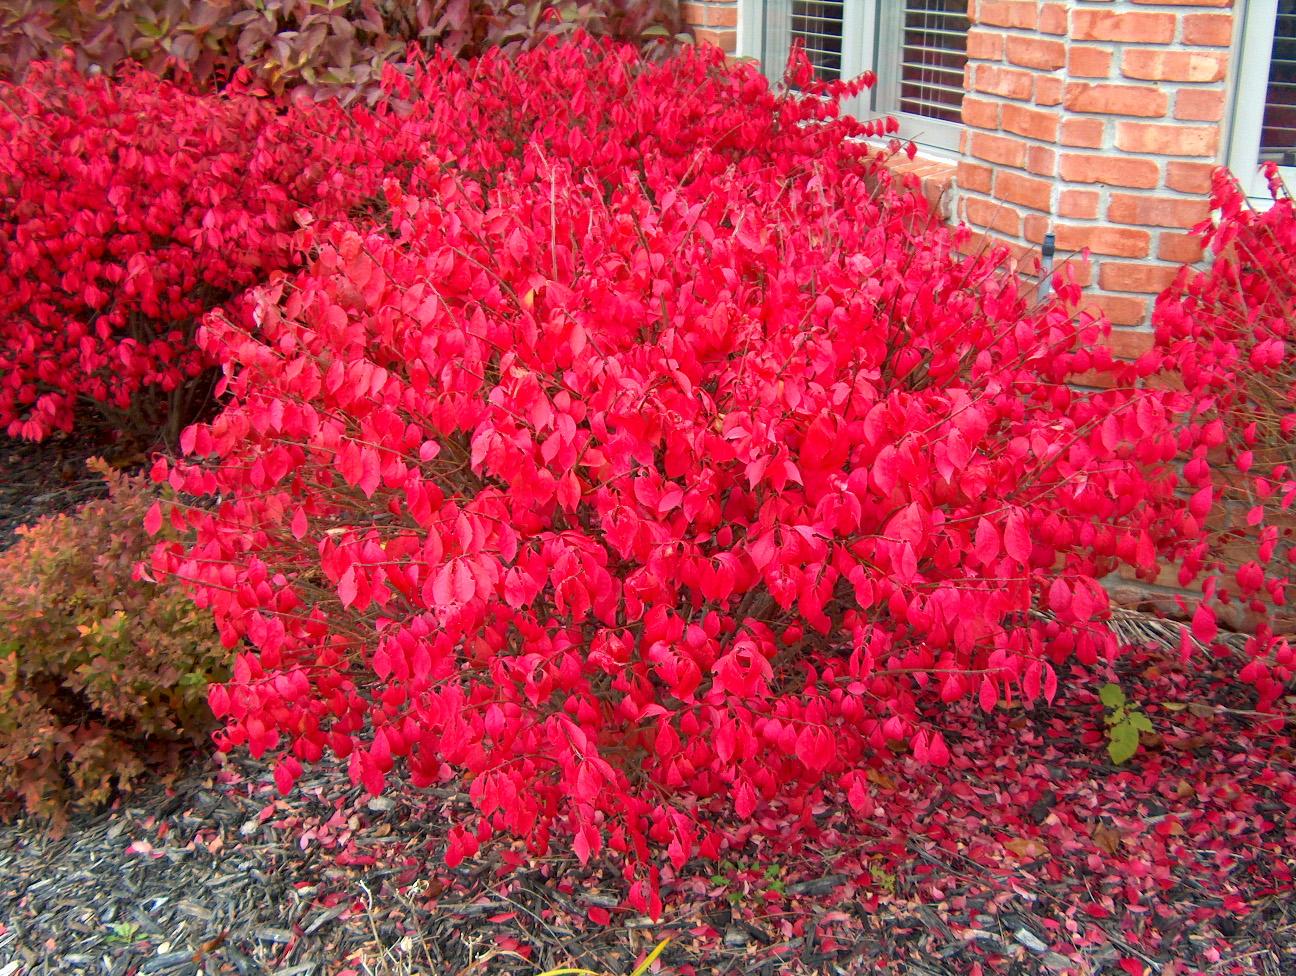 Euonymous Alatus - Burning Spindle Bush Euonymus - XXXL 150cm Heavy Specimen Gardening Express